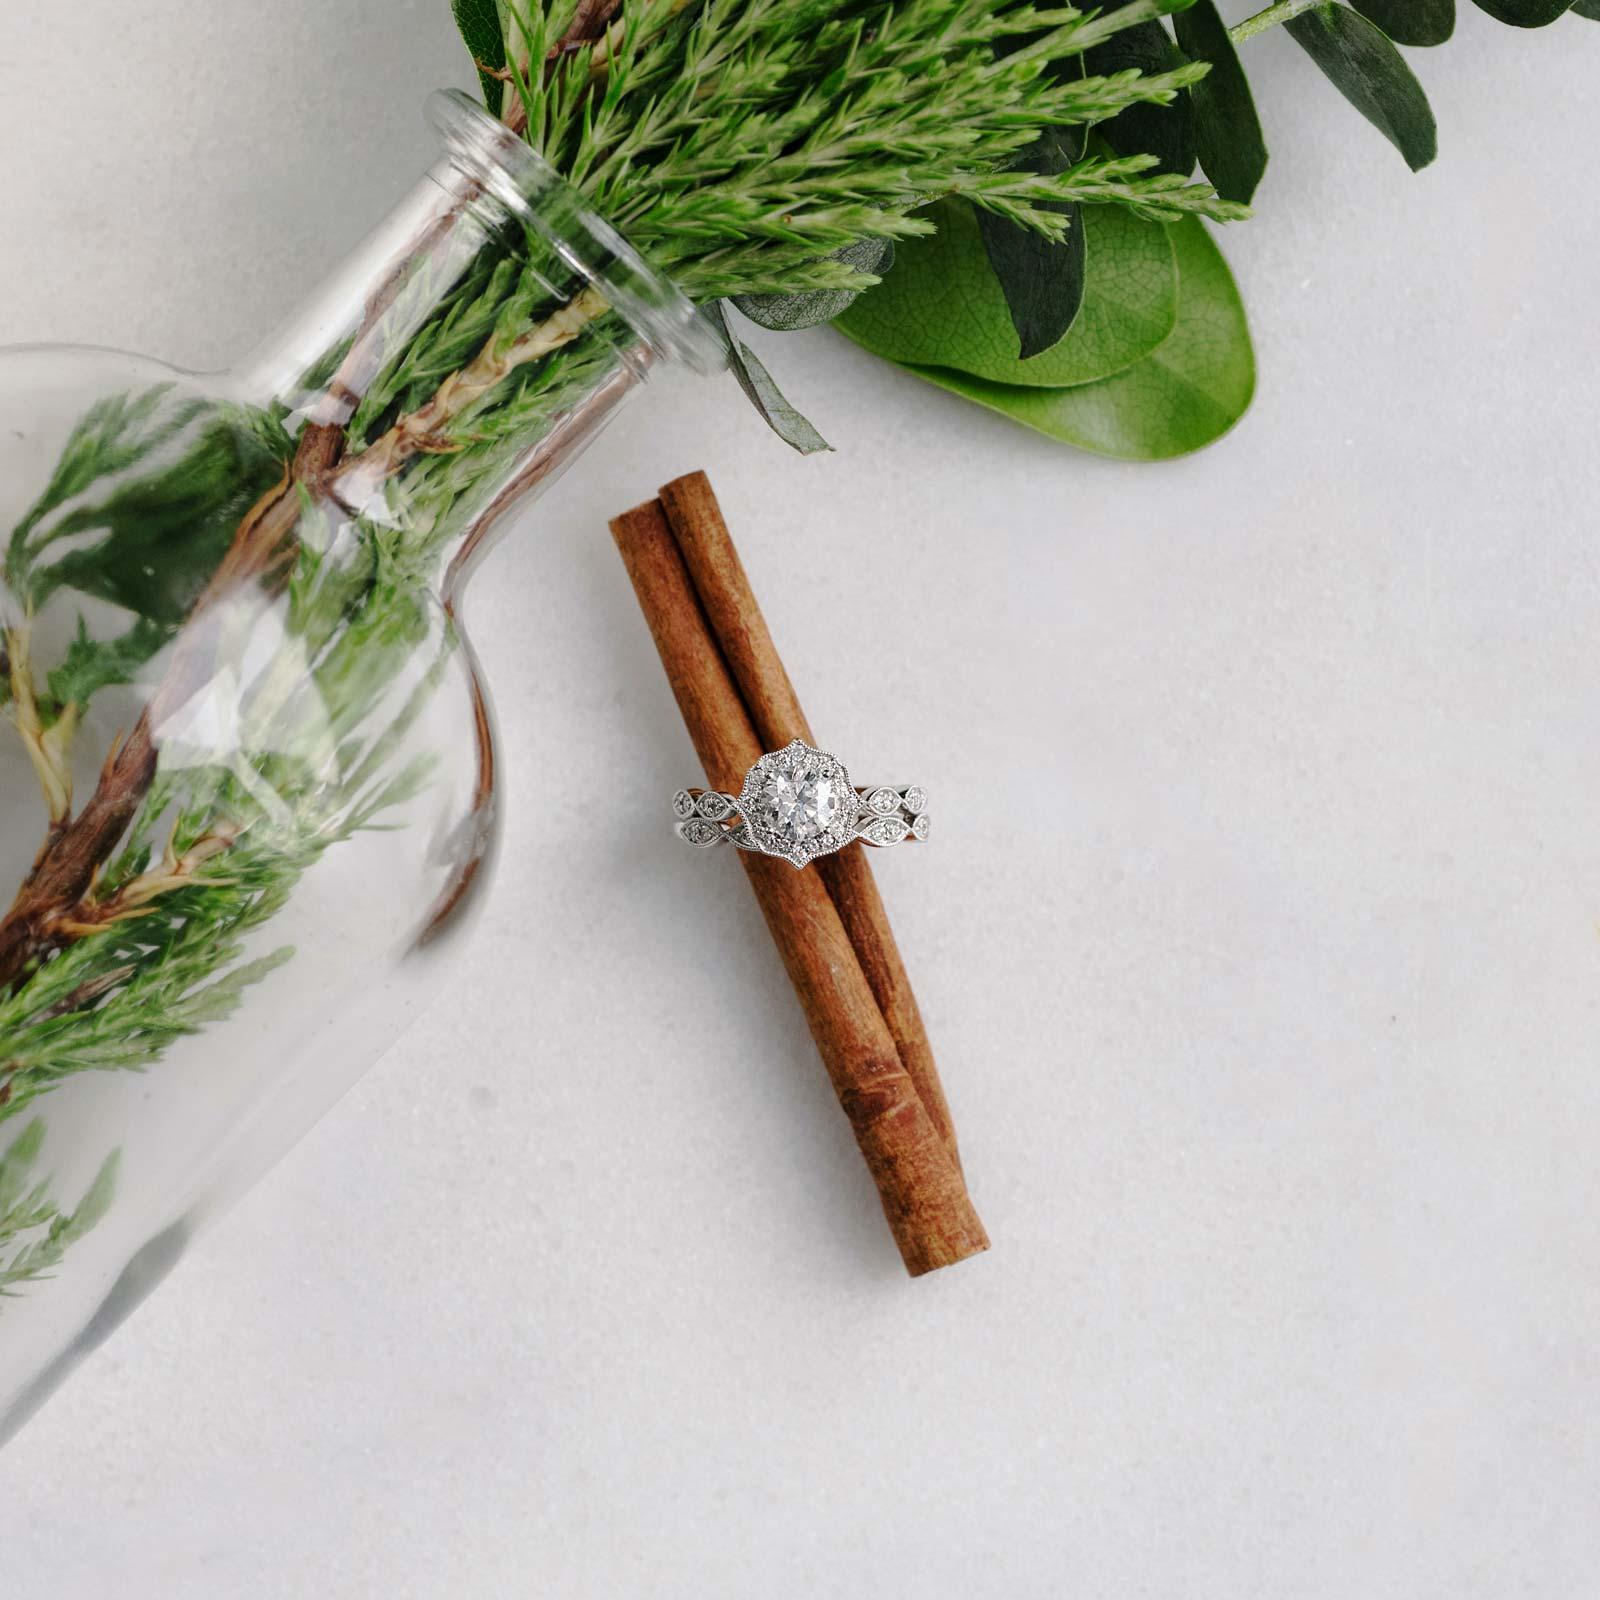 Paris Jewellers diamond ring photograph with greenery